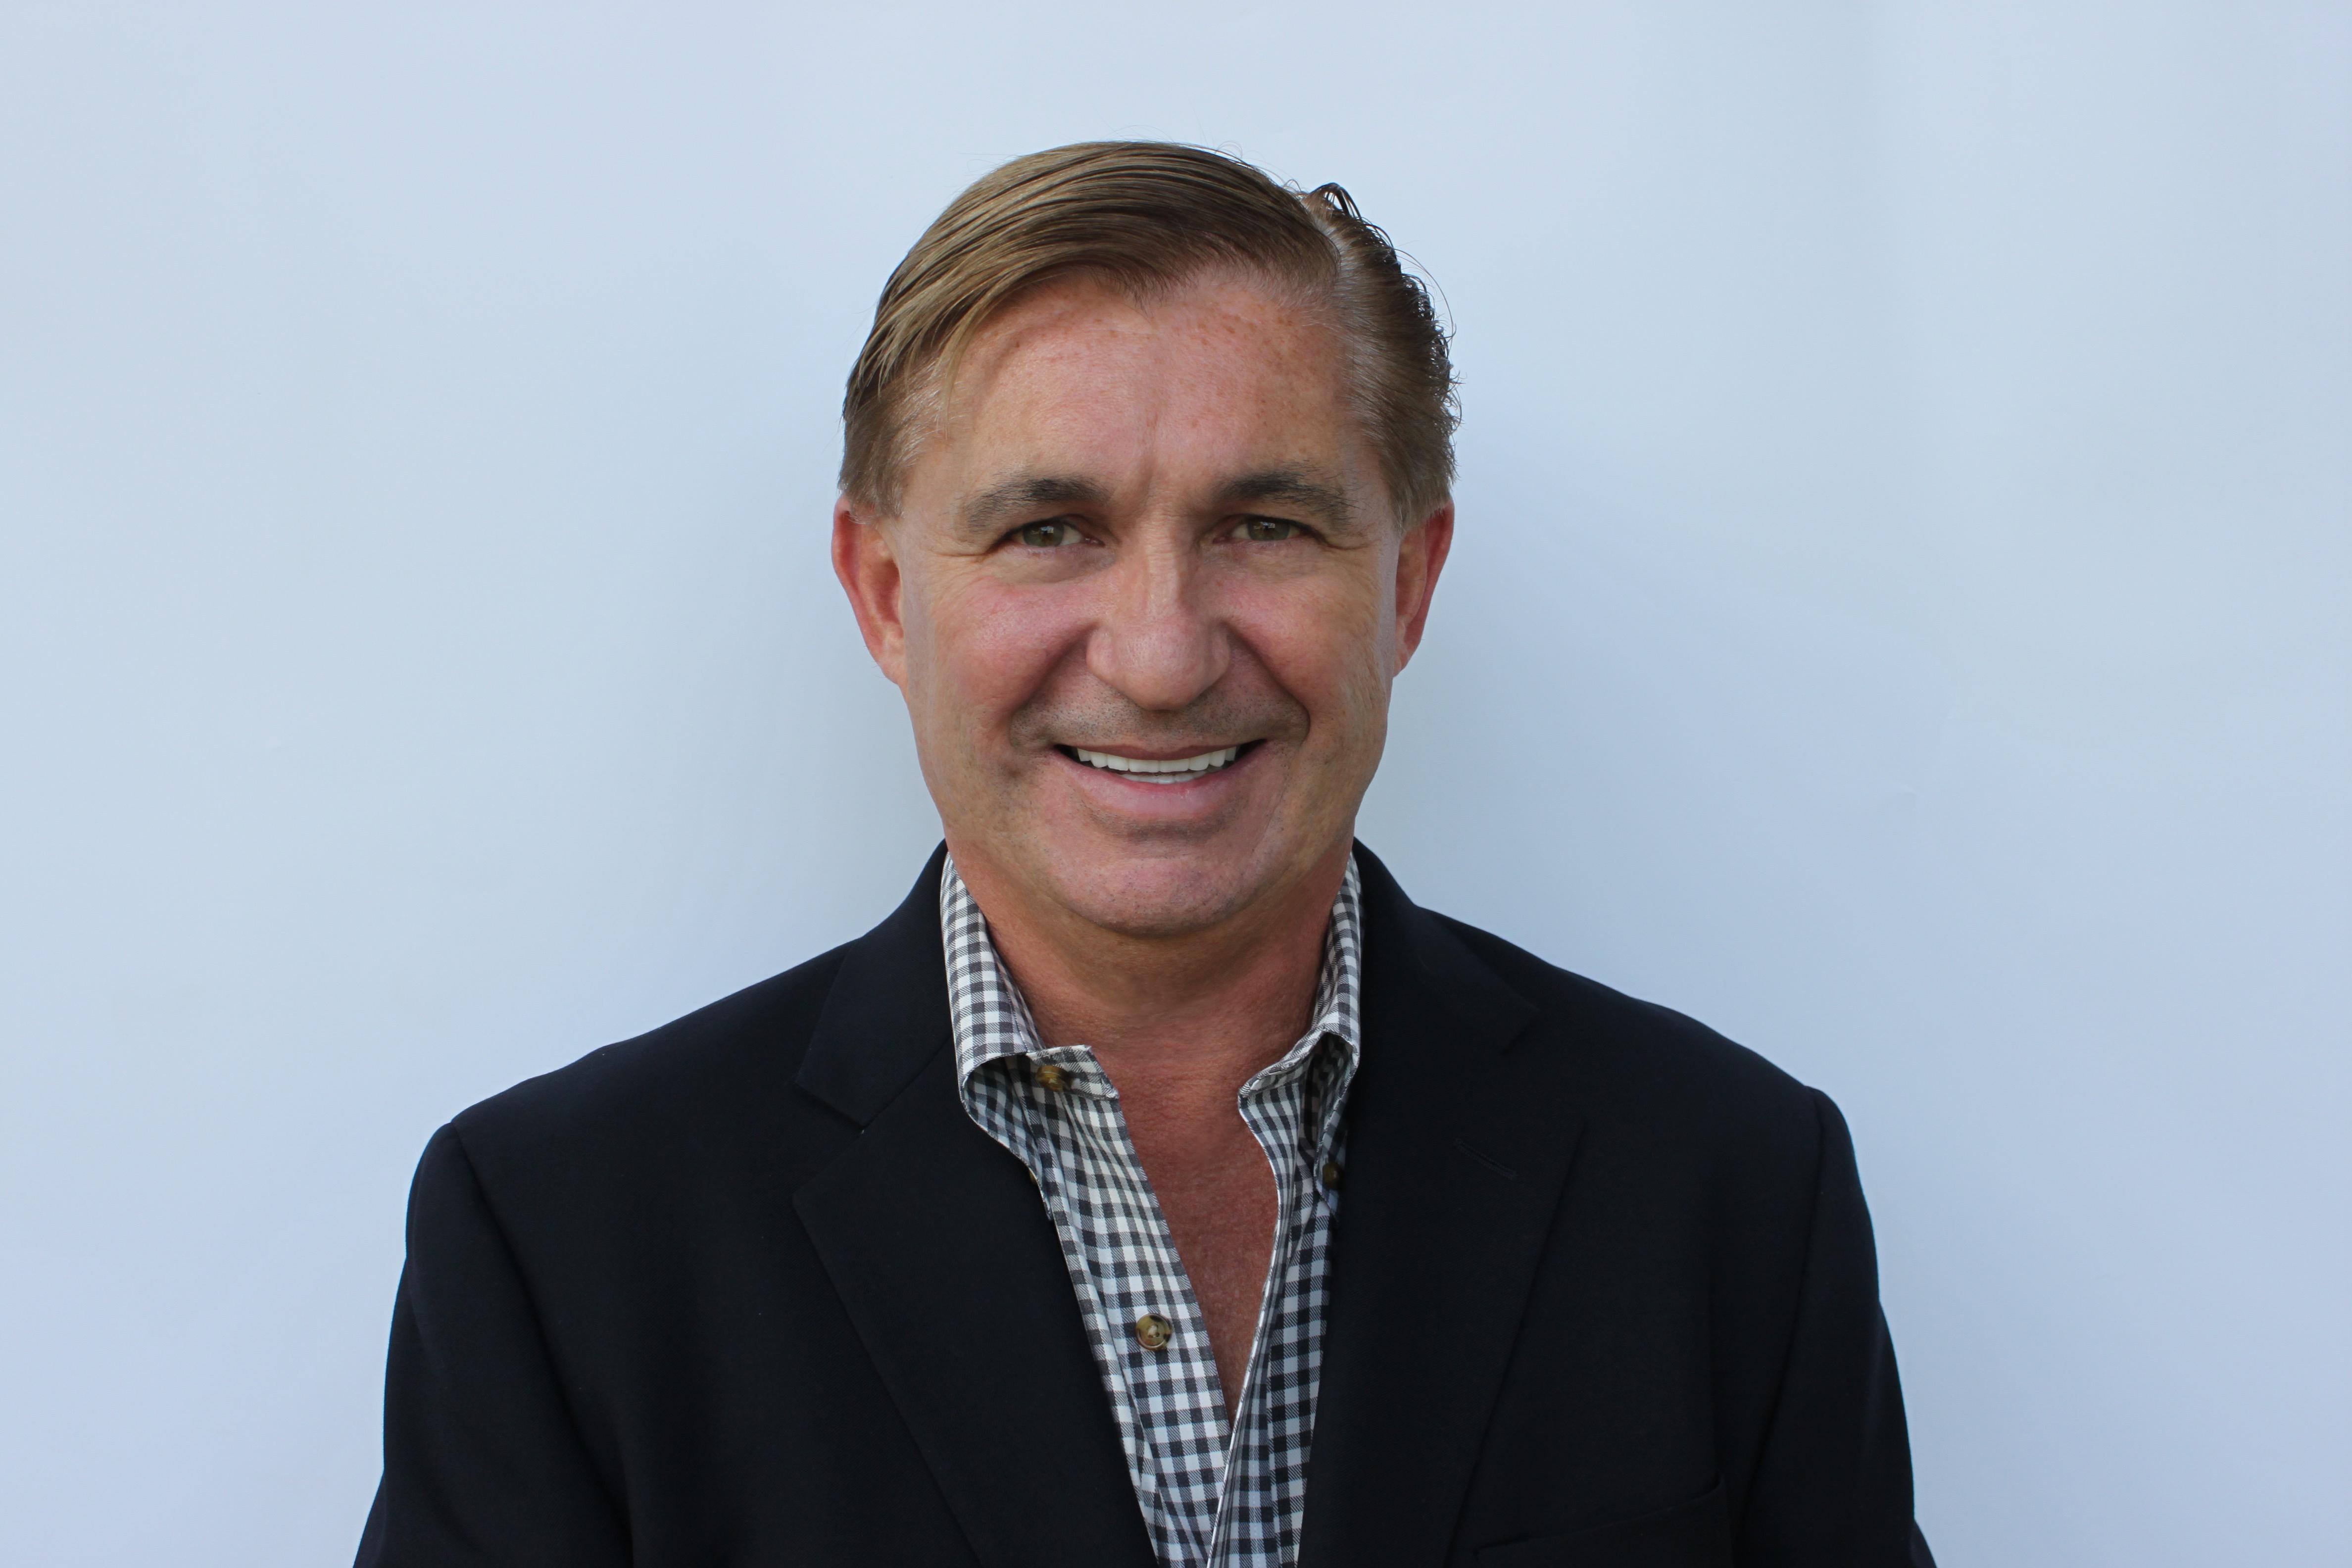 Ian Schenkel, President and CEO